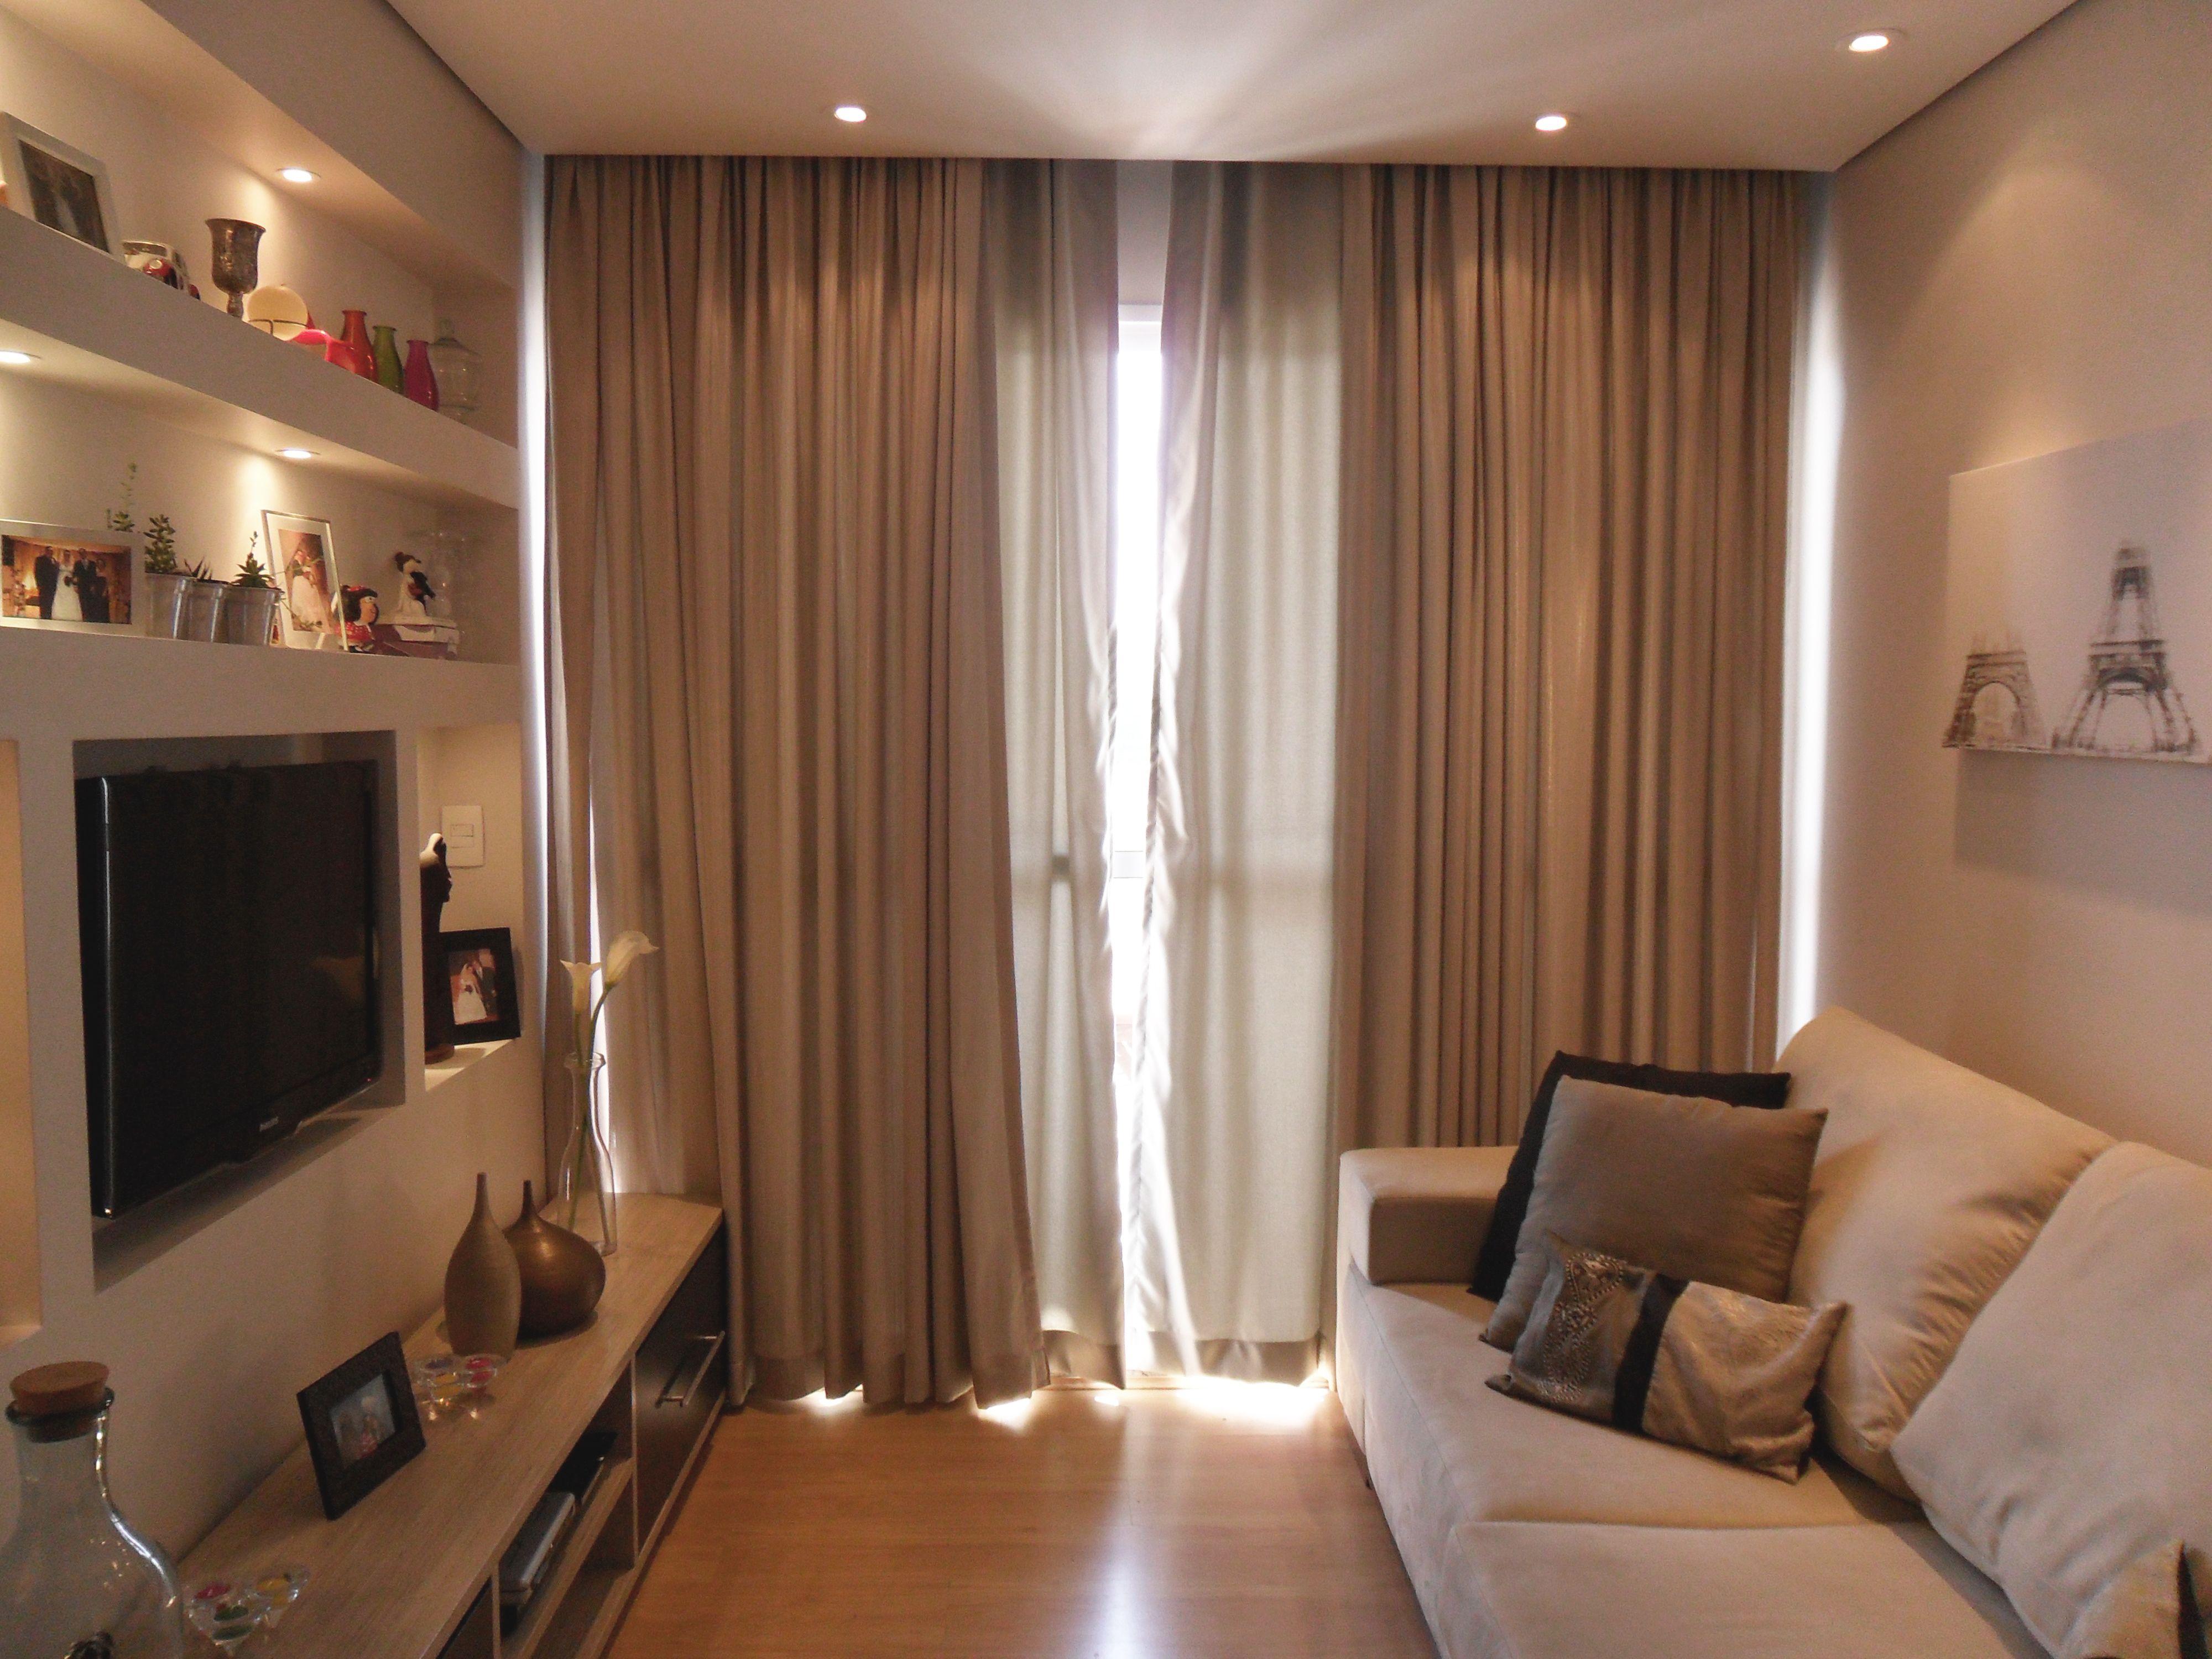 Sala de estar decora o interiores apartamento pesquisa - Cortinas interiores casa ...